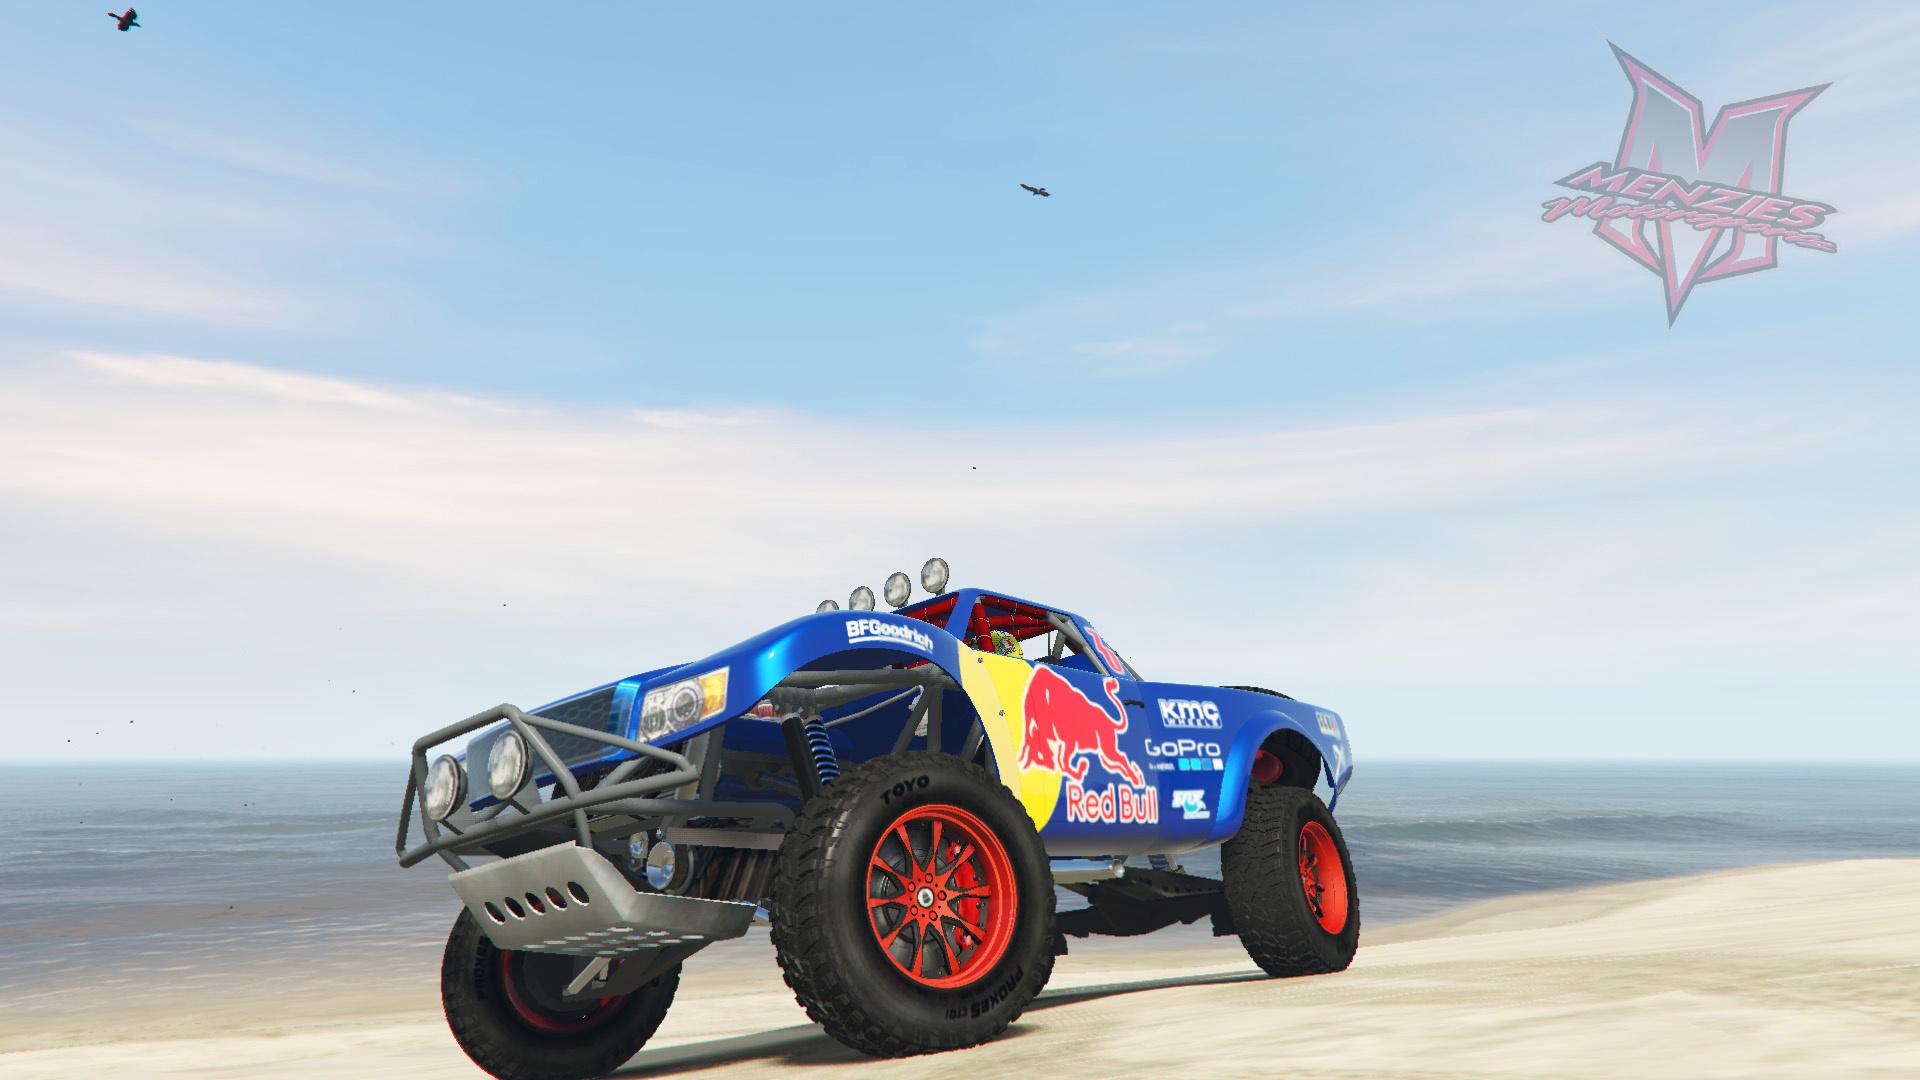 Trophy Truck Red Bull Livery Gta5 Mods Com